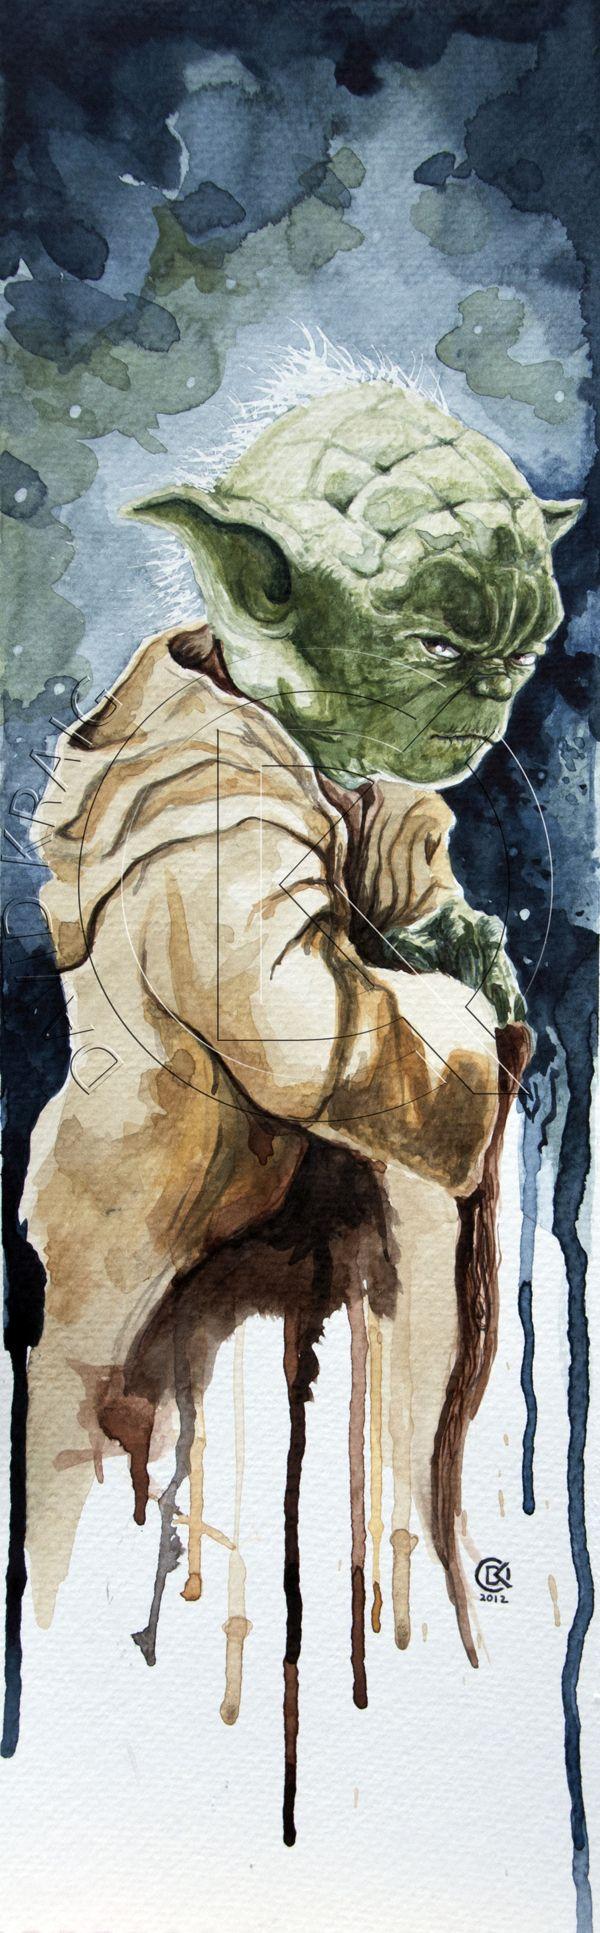 Yoda Watercolor Study by David Kraig, via Behance